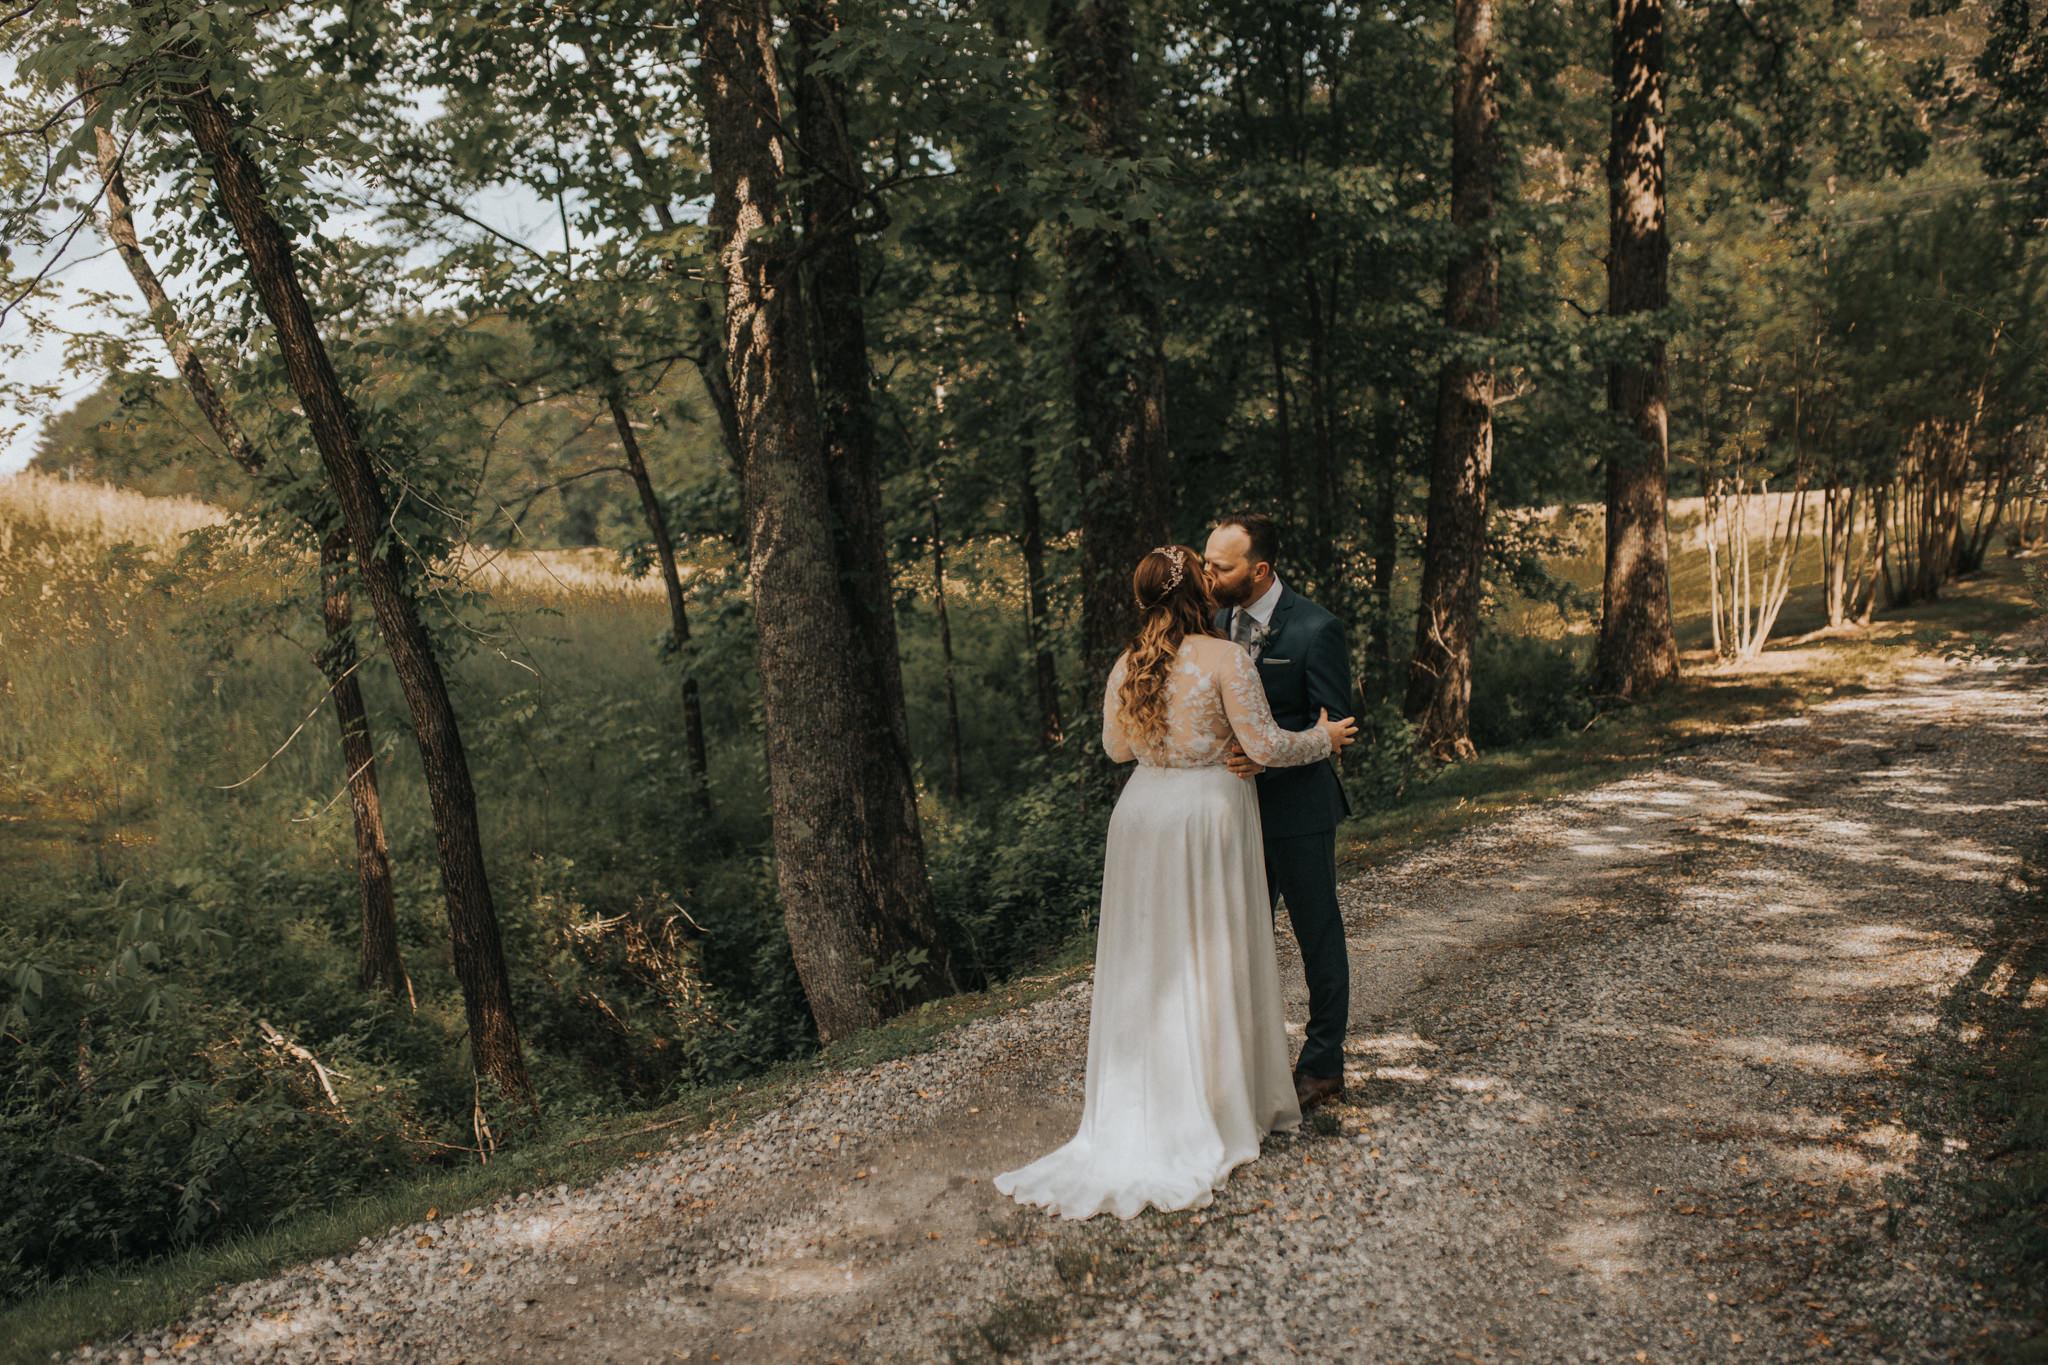 KateMatt-North-Georgia-Wedding-Photographer-Mountain-Laurel-Farm-44.jpg